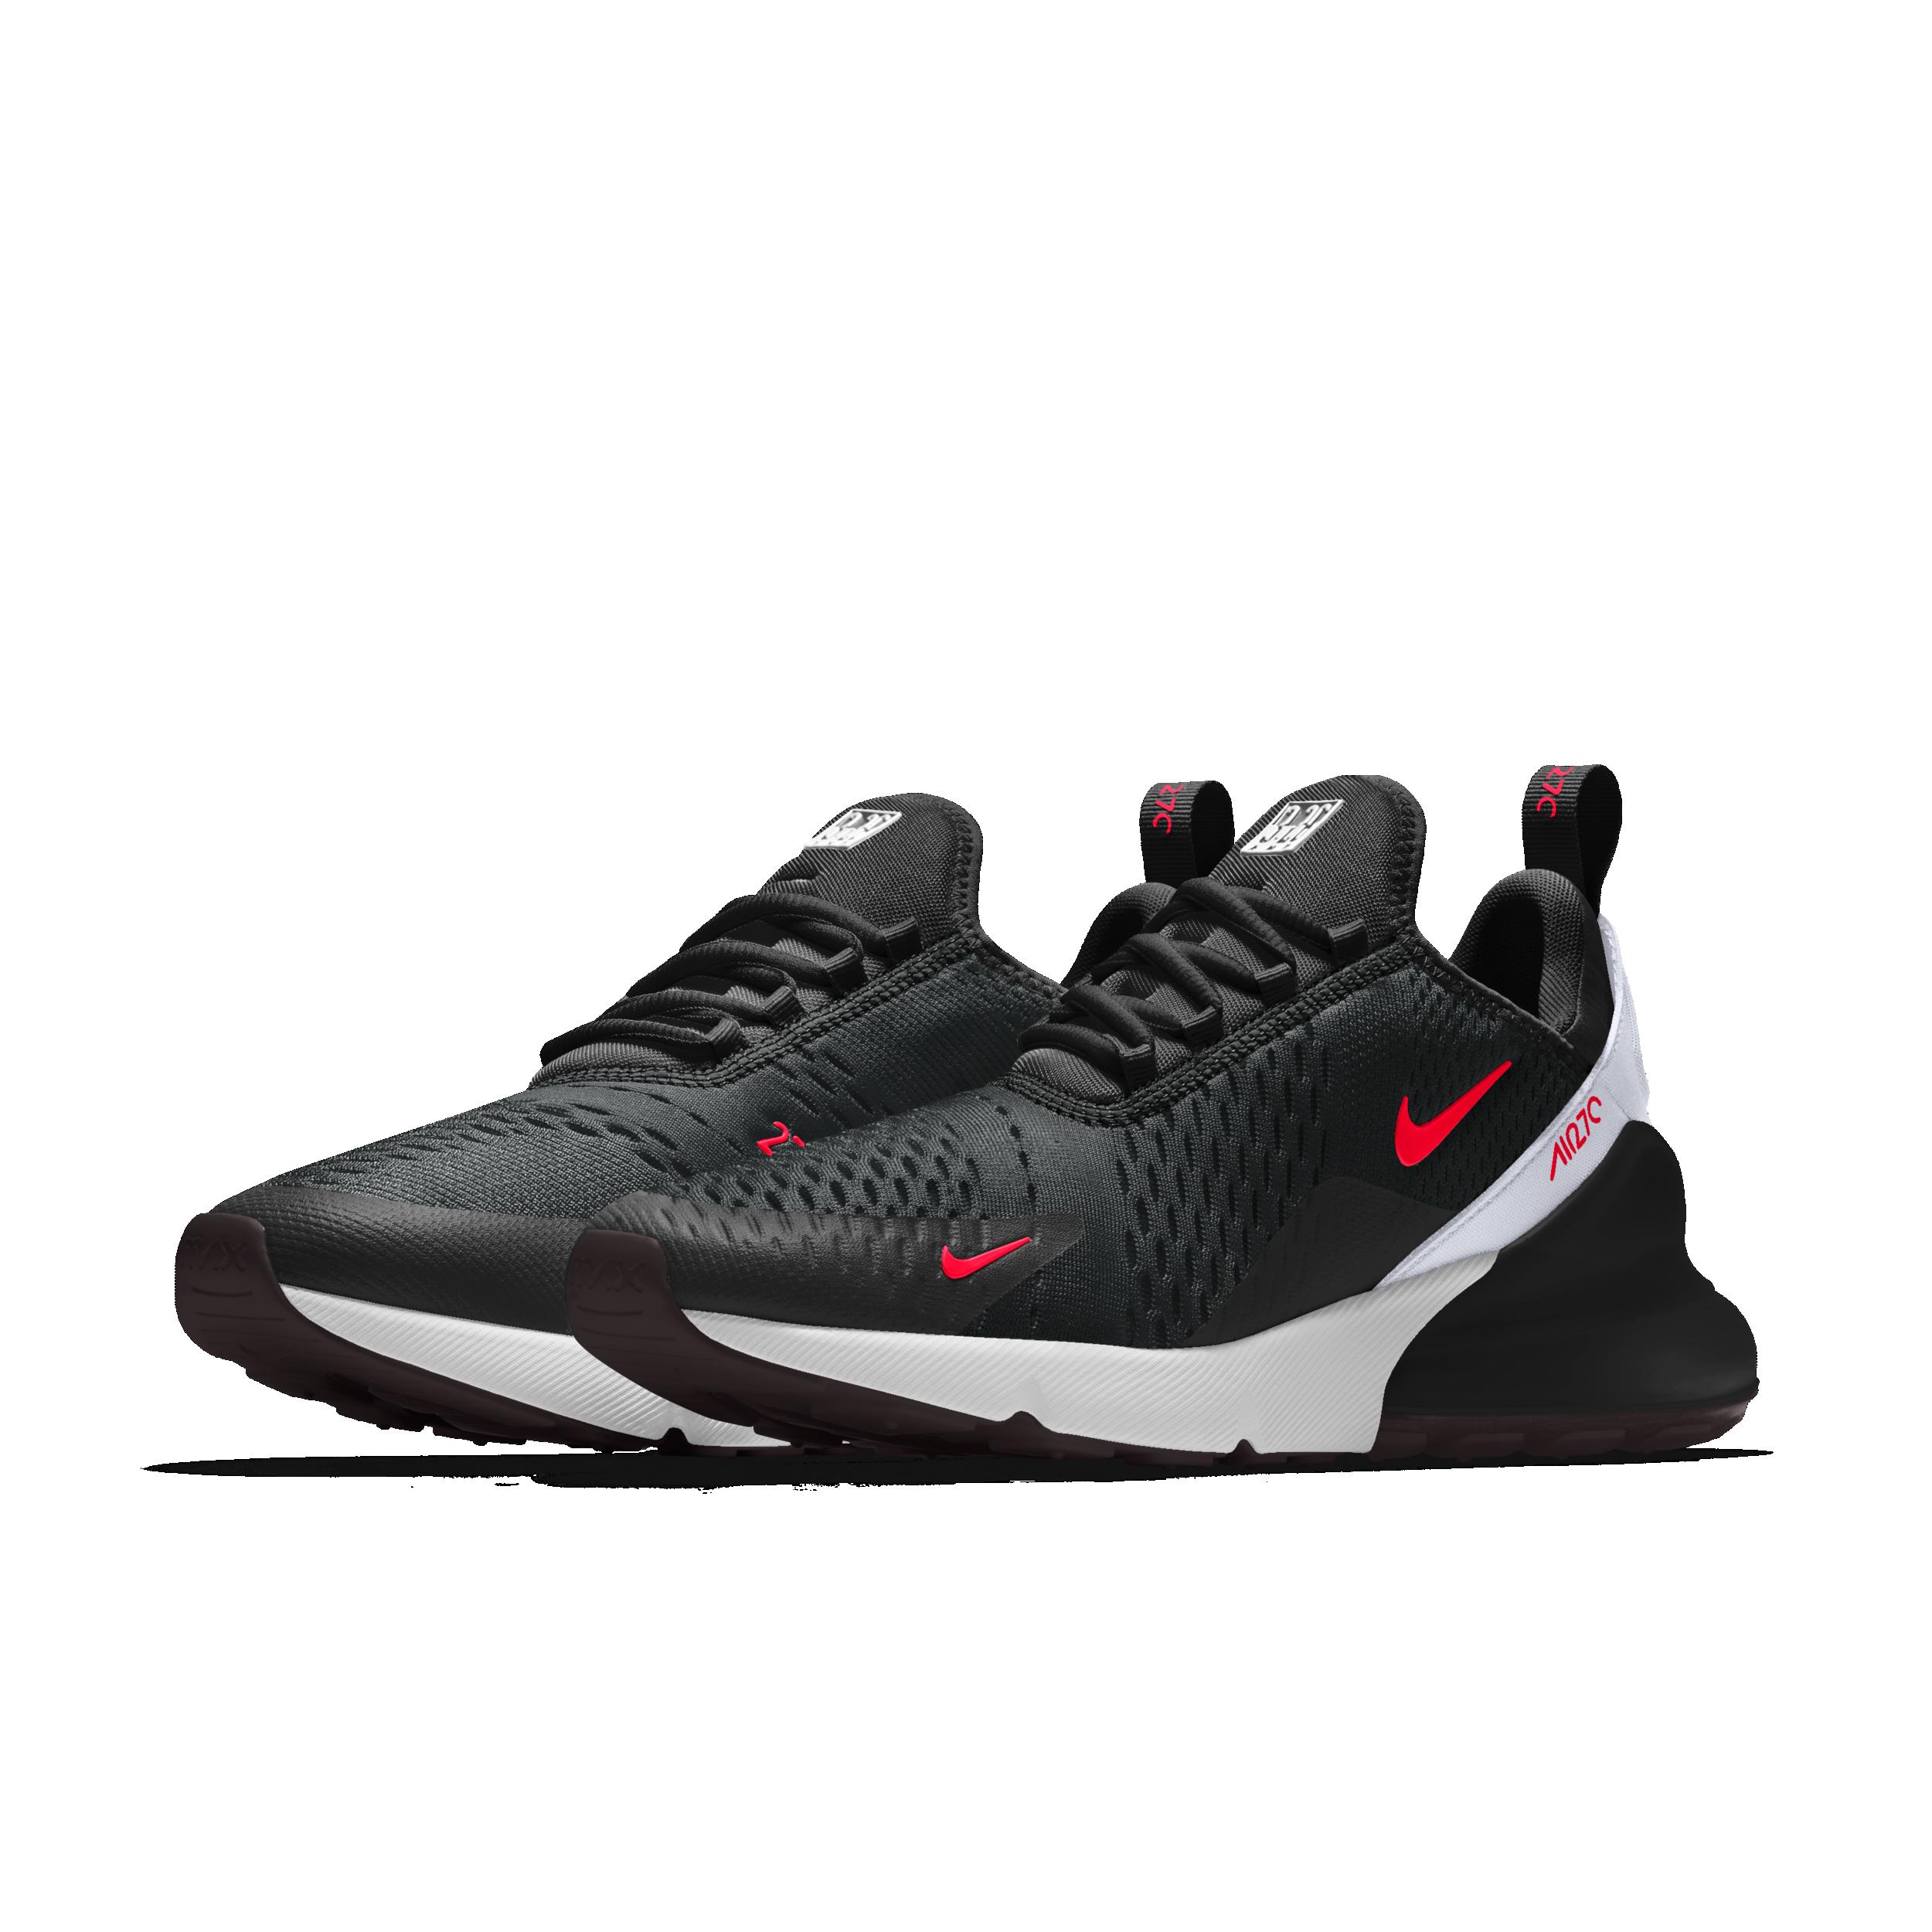 Nike Air Max 270 Id Schuh Nike Com De Nike Free Shoes Nike Air Max Mens Nike Air Max